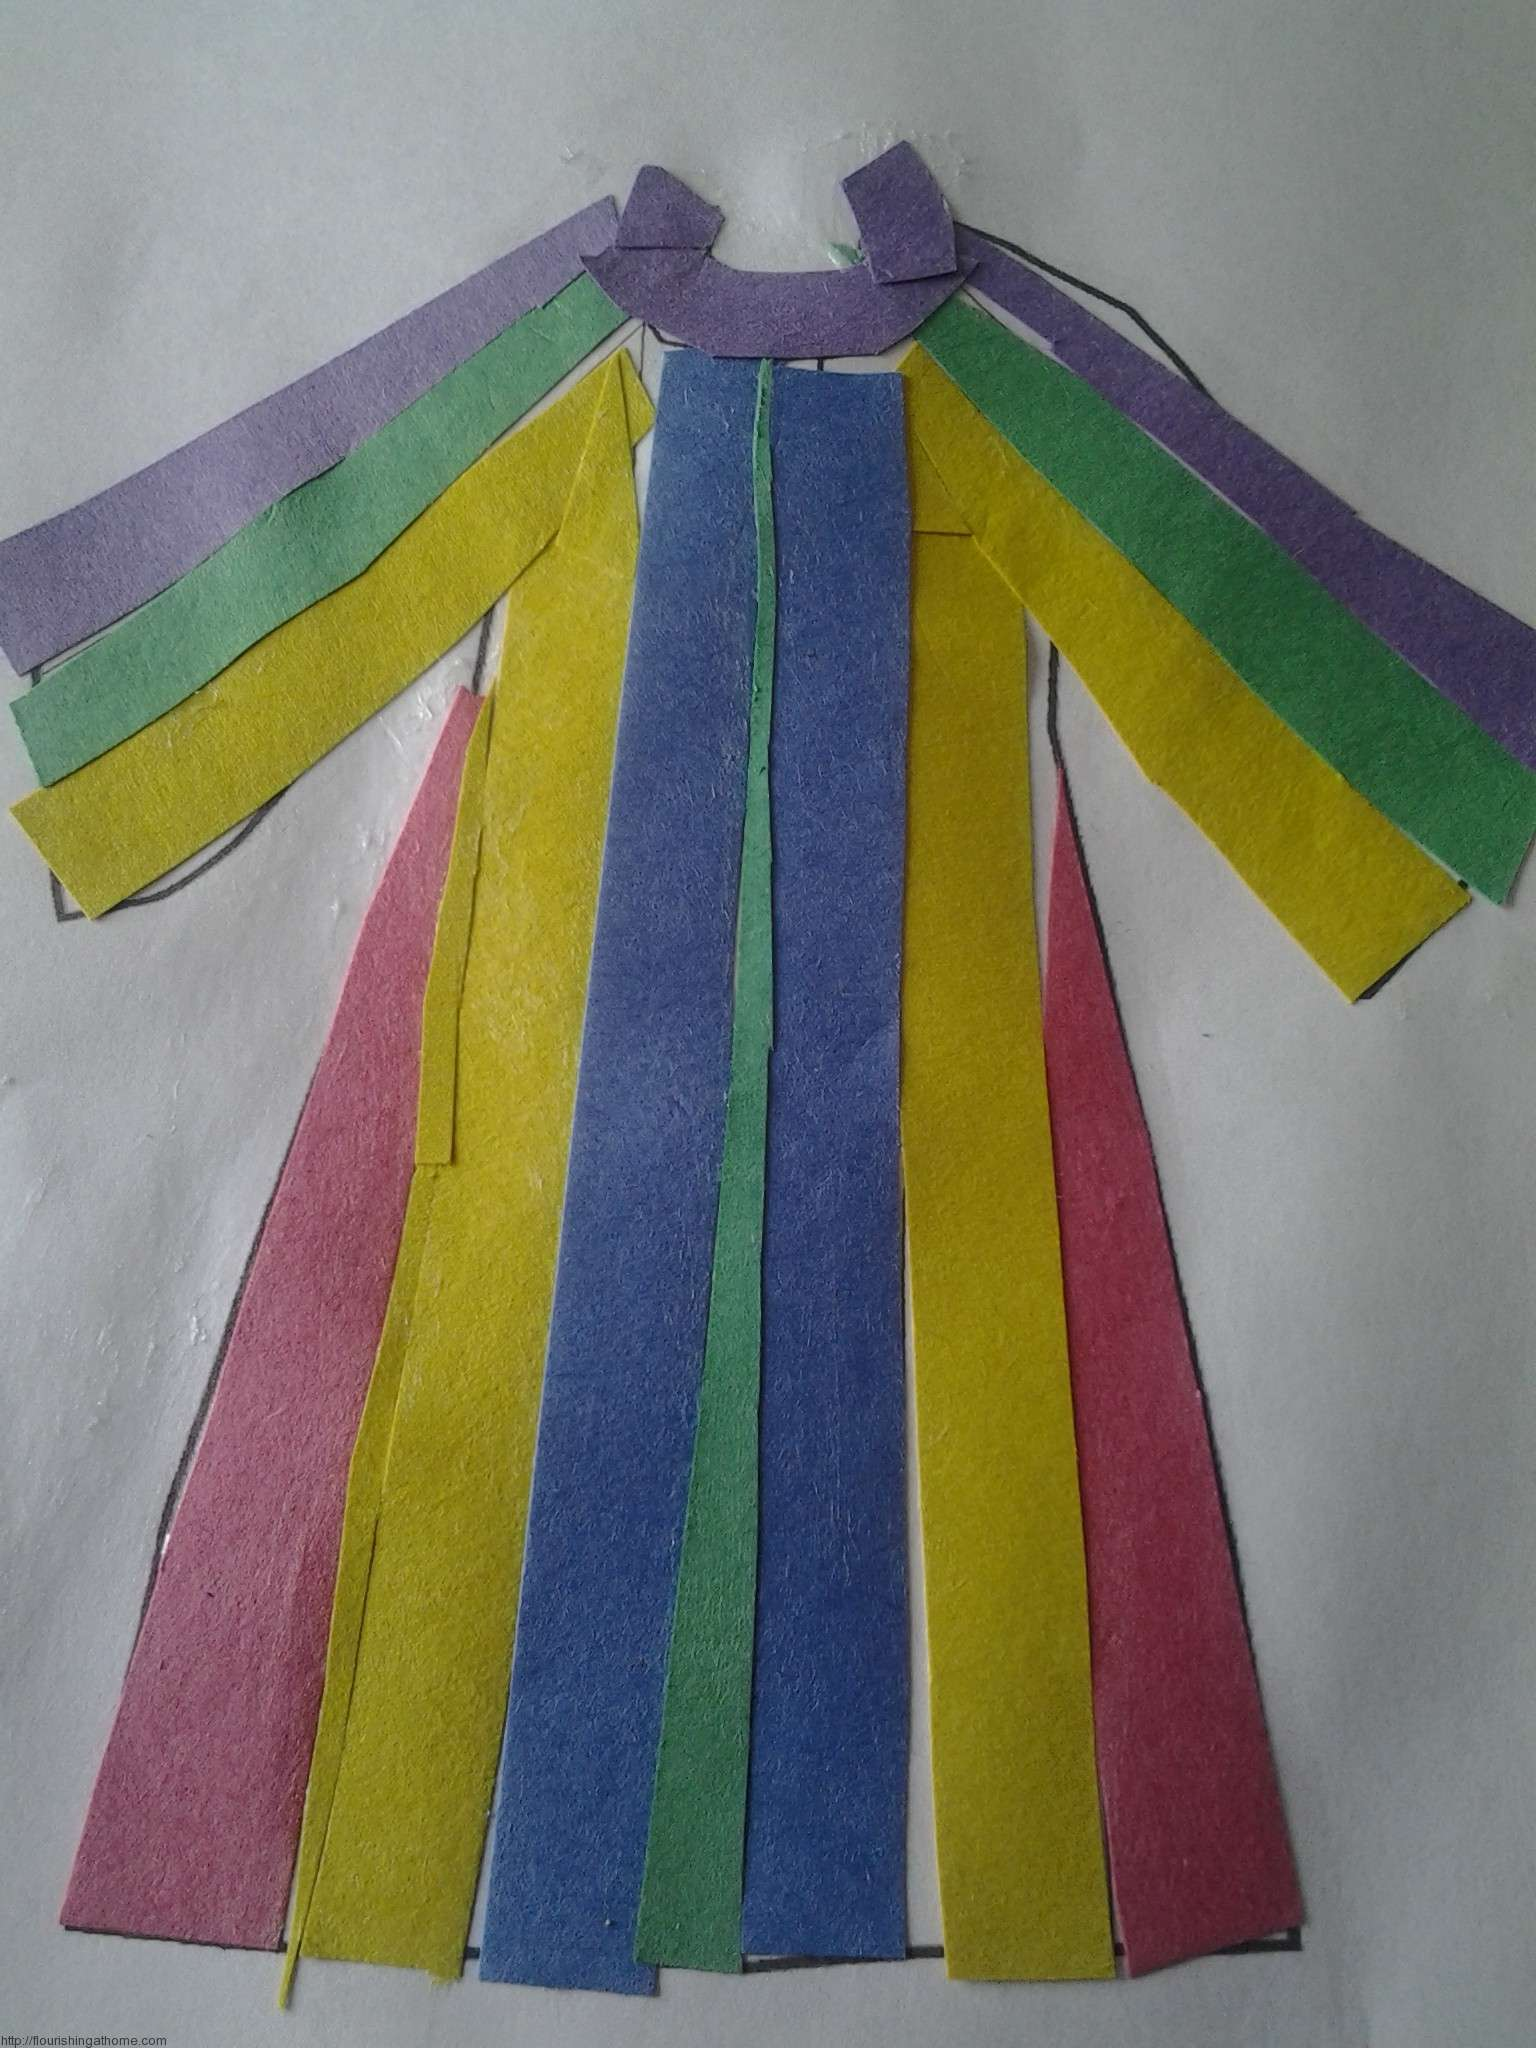 teaching bible stories to children joseph u0027s coat of many colors